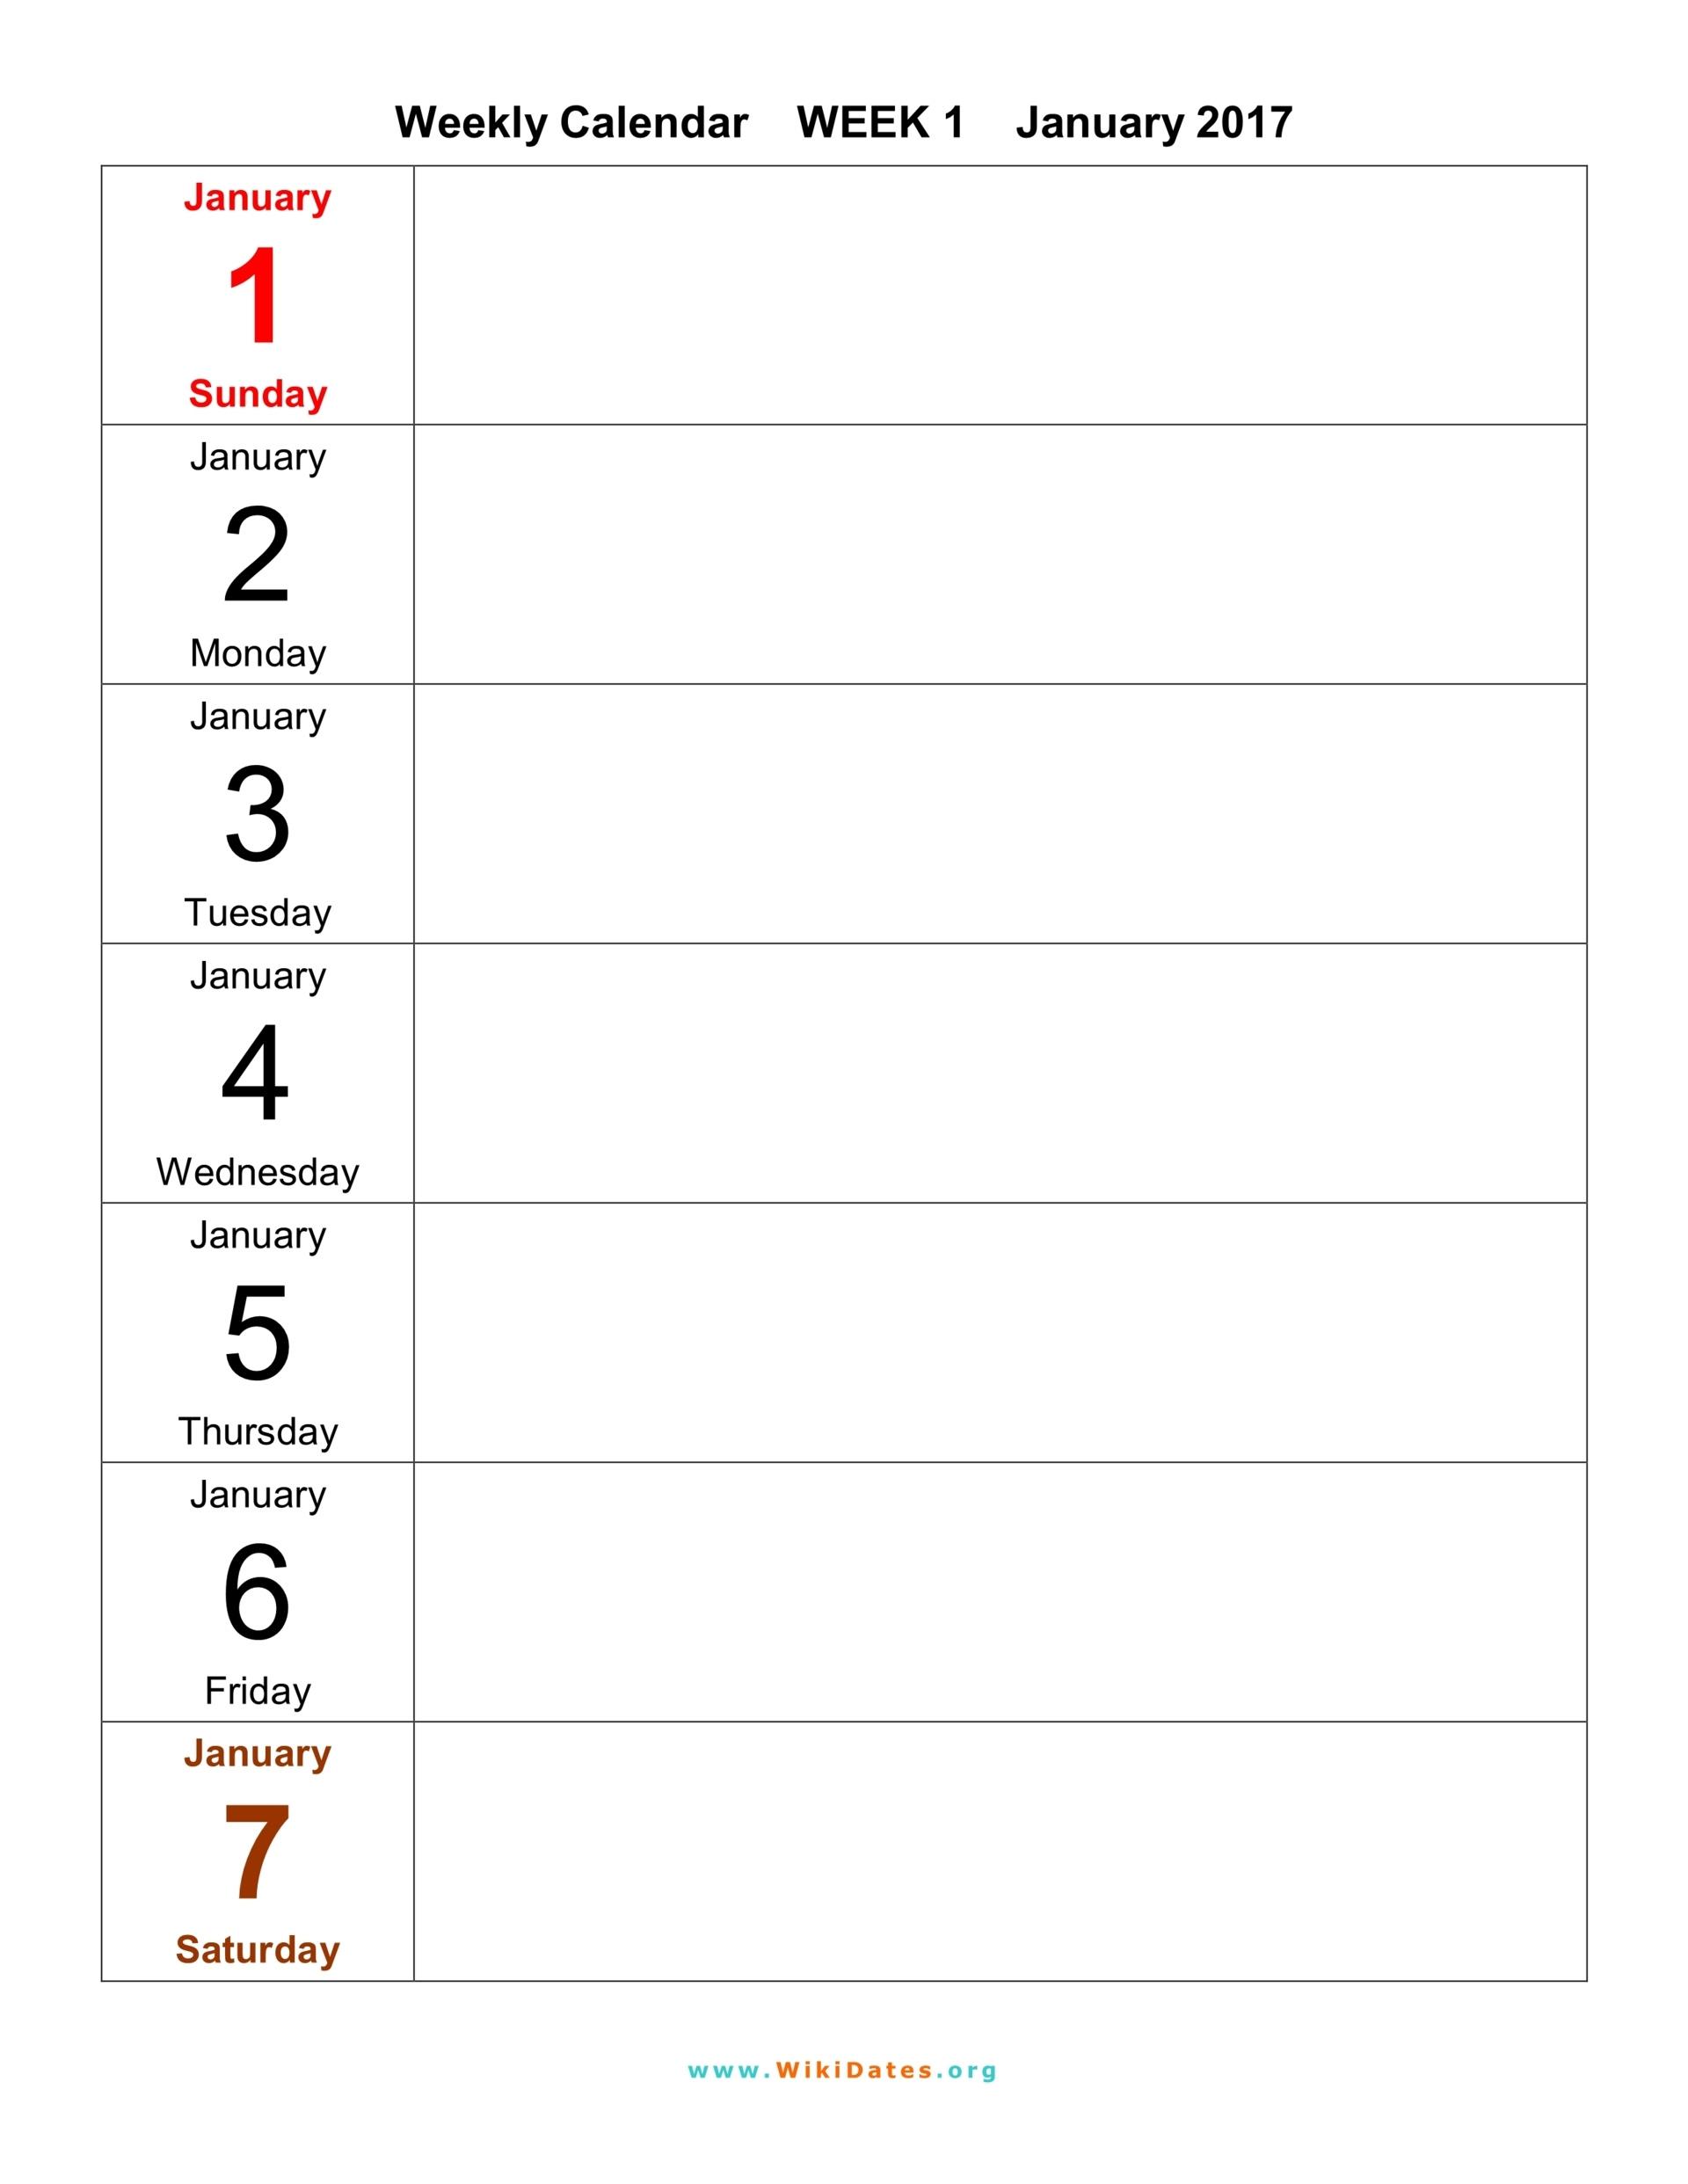 Weekly Calendar 2016 2017 2018   WikiDates.org